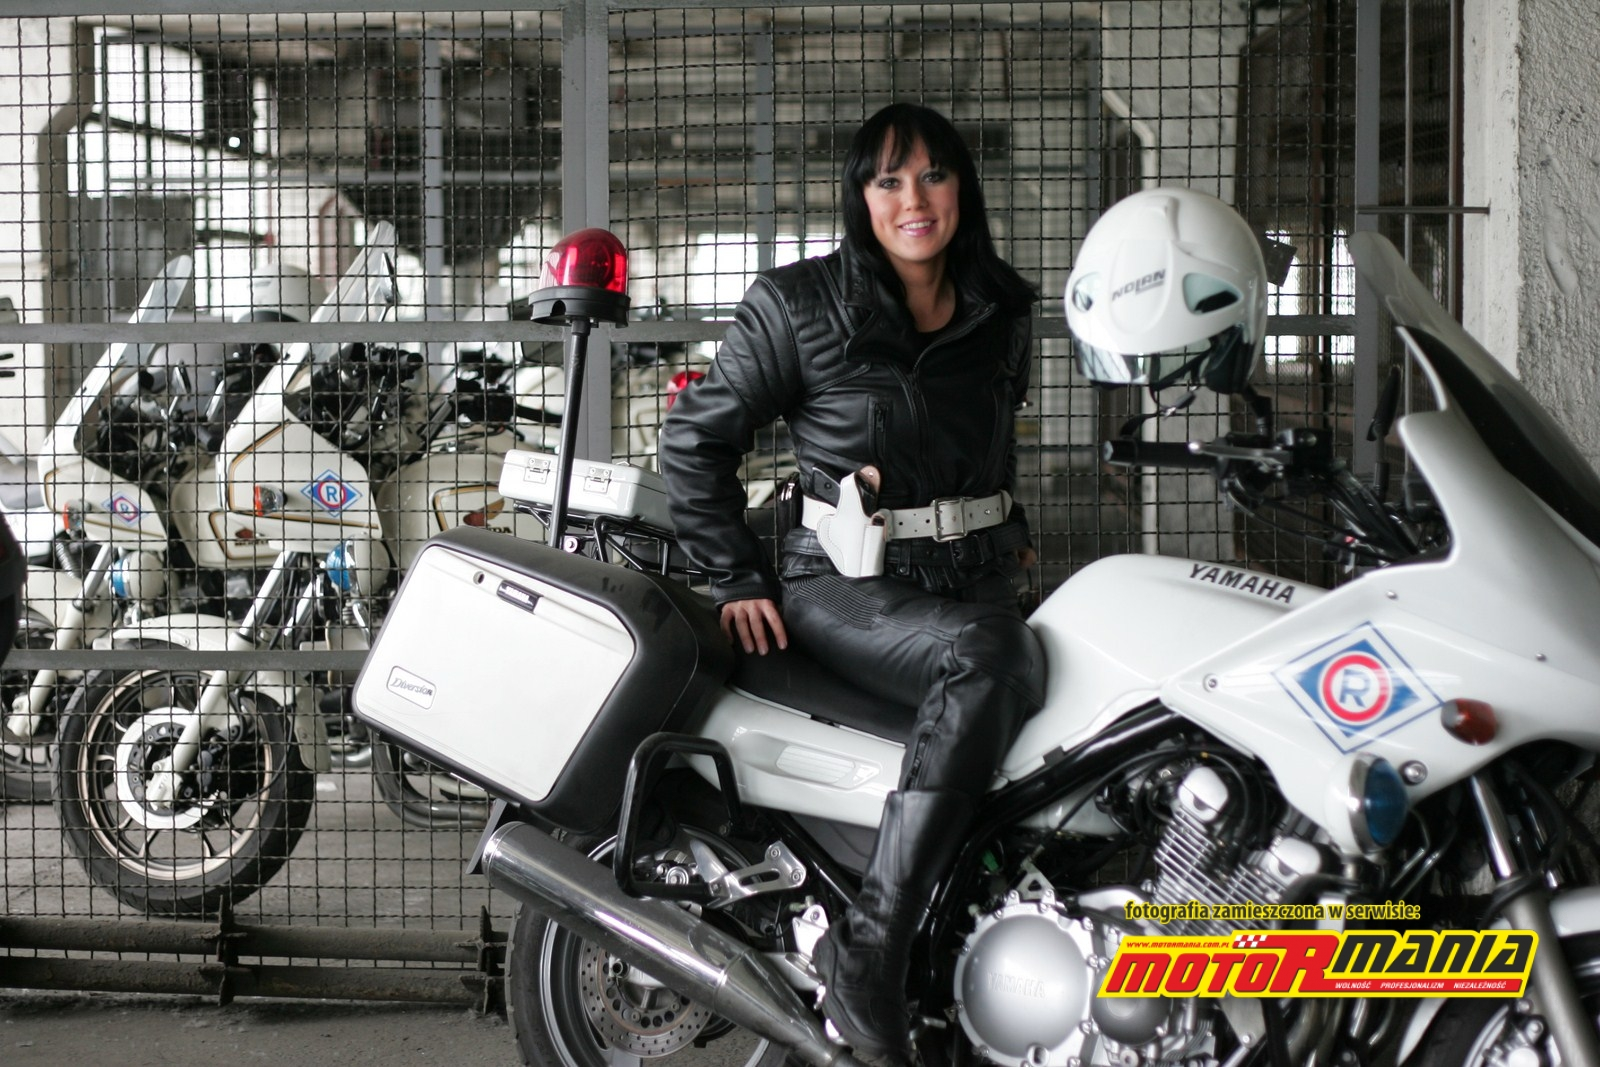 Policjantki Motormania Motocykle Skutery Newsy